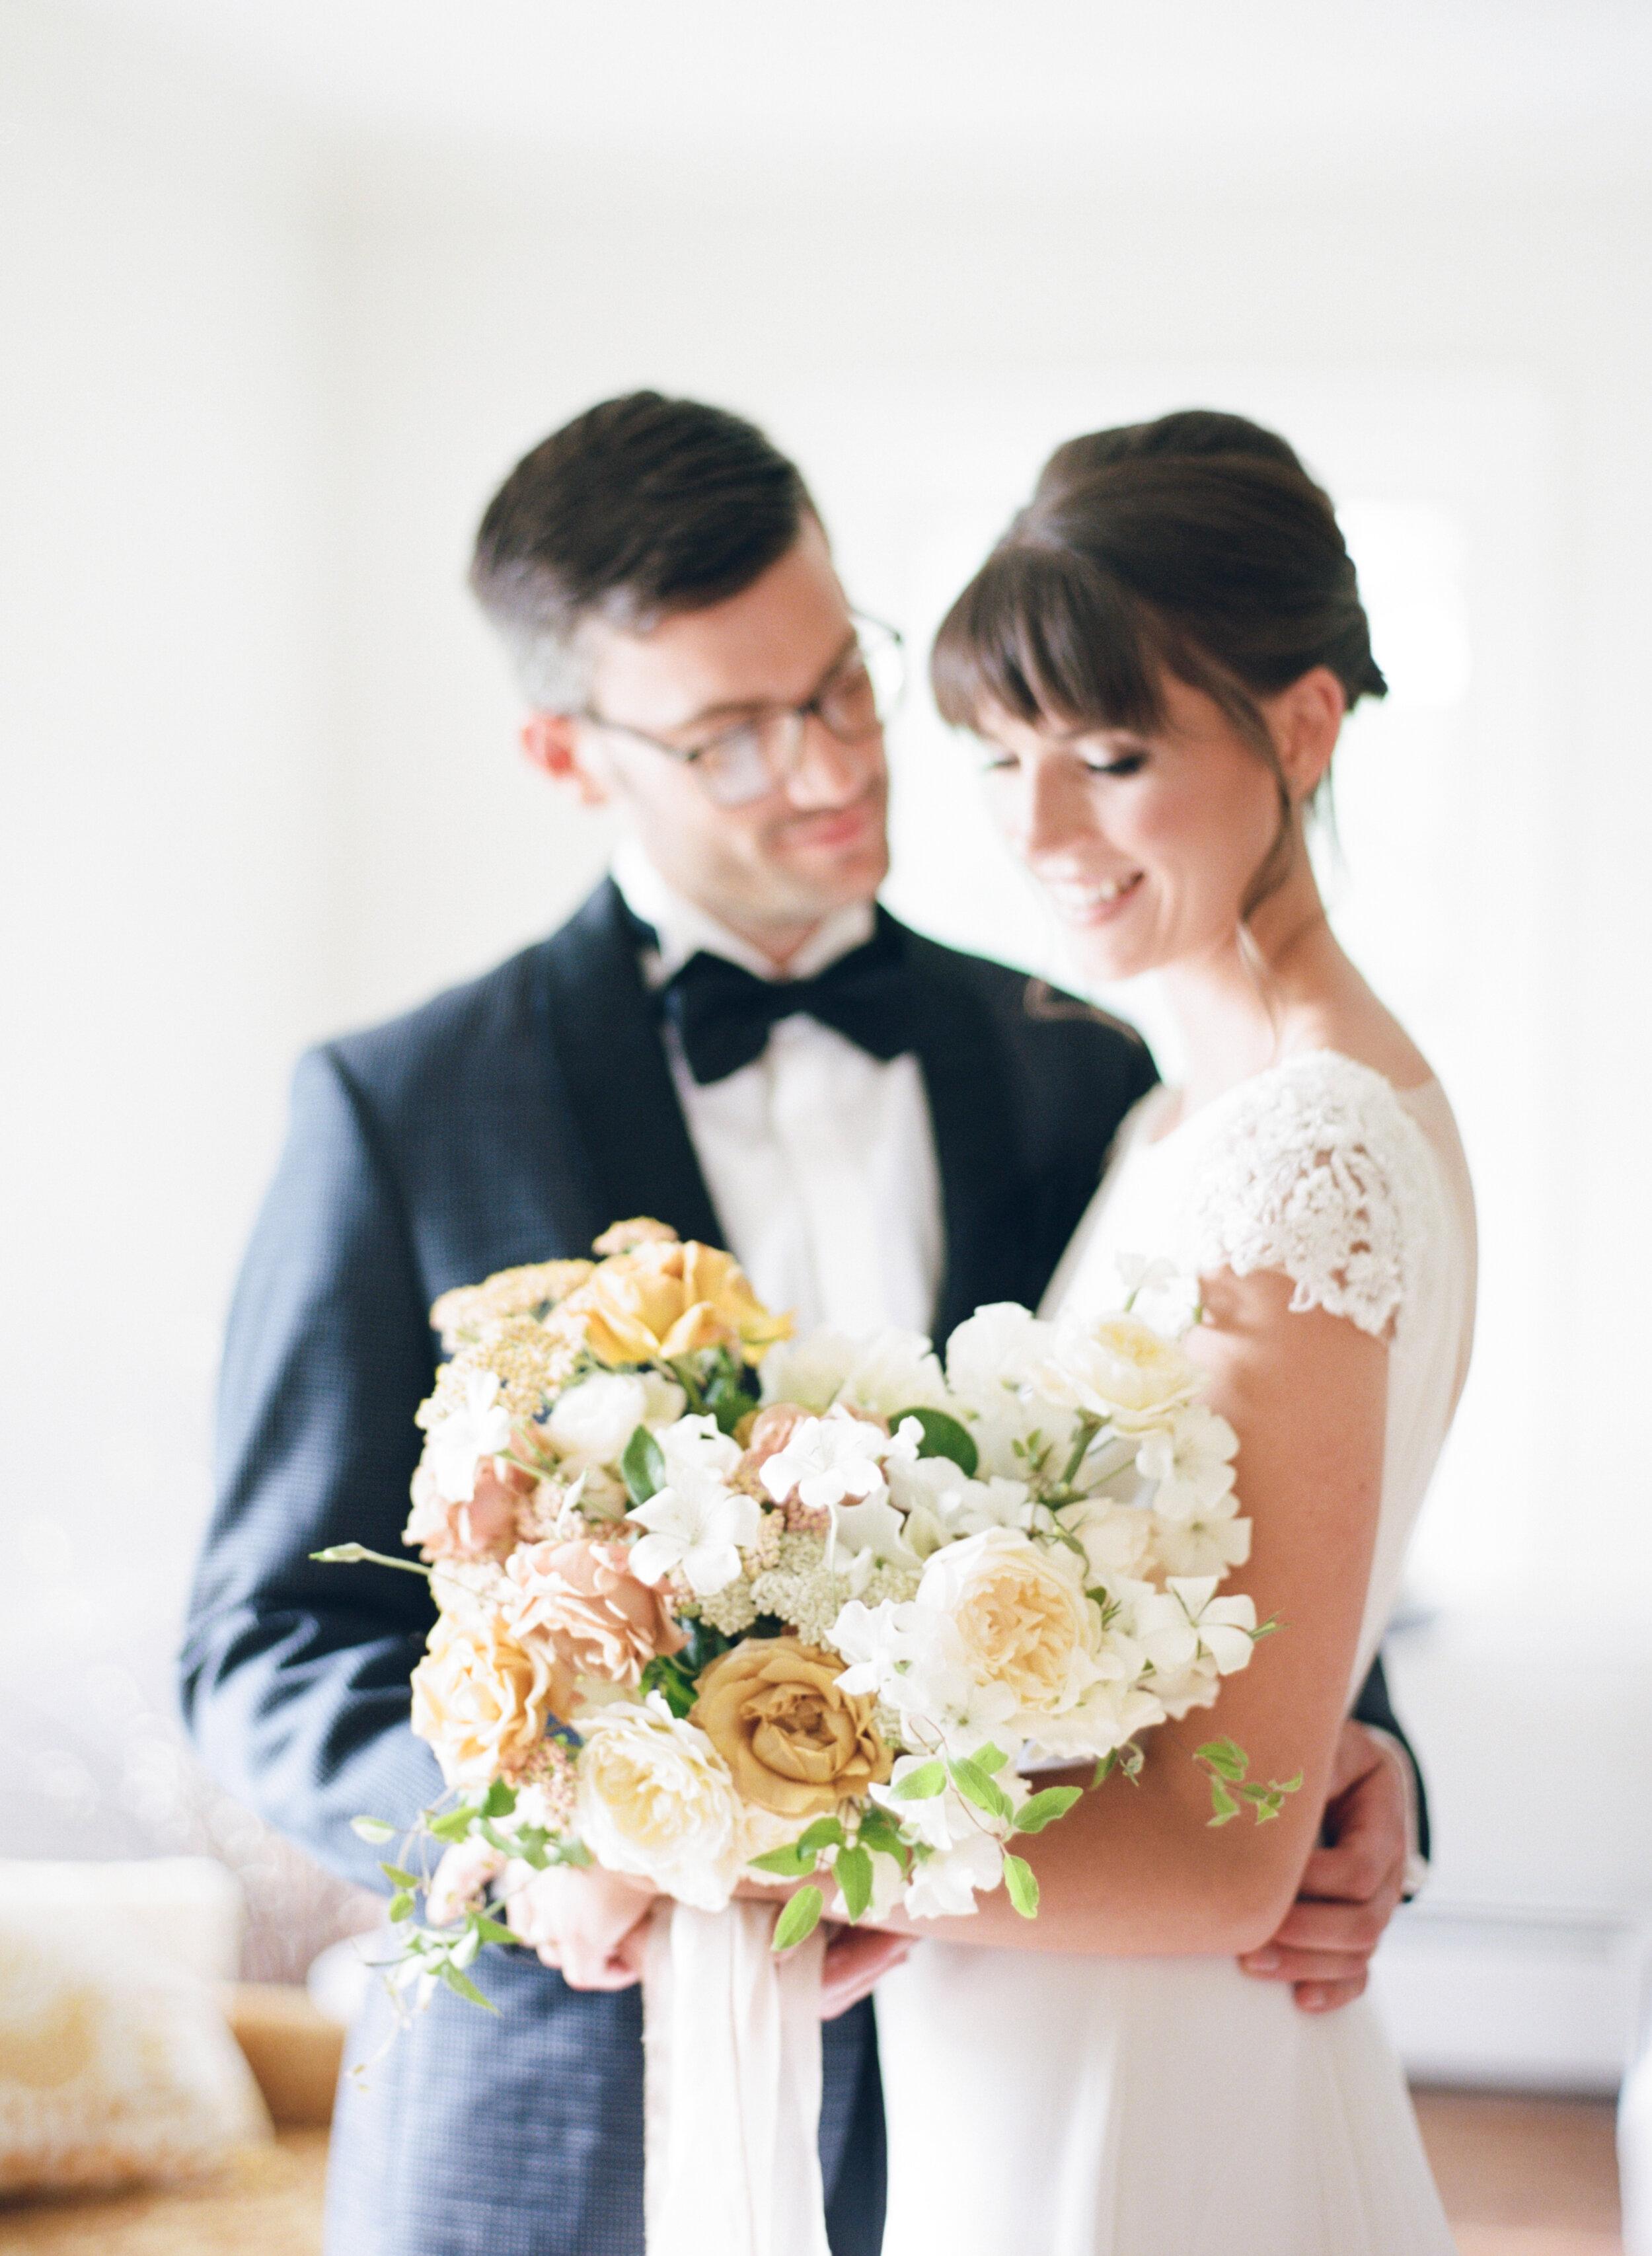 alexandra-meseke-understated-soft-luxury-wedding-upstate-ny_0048.jpg